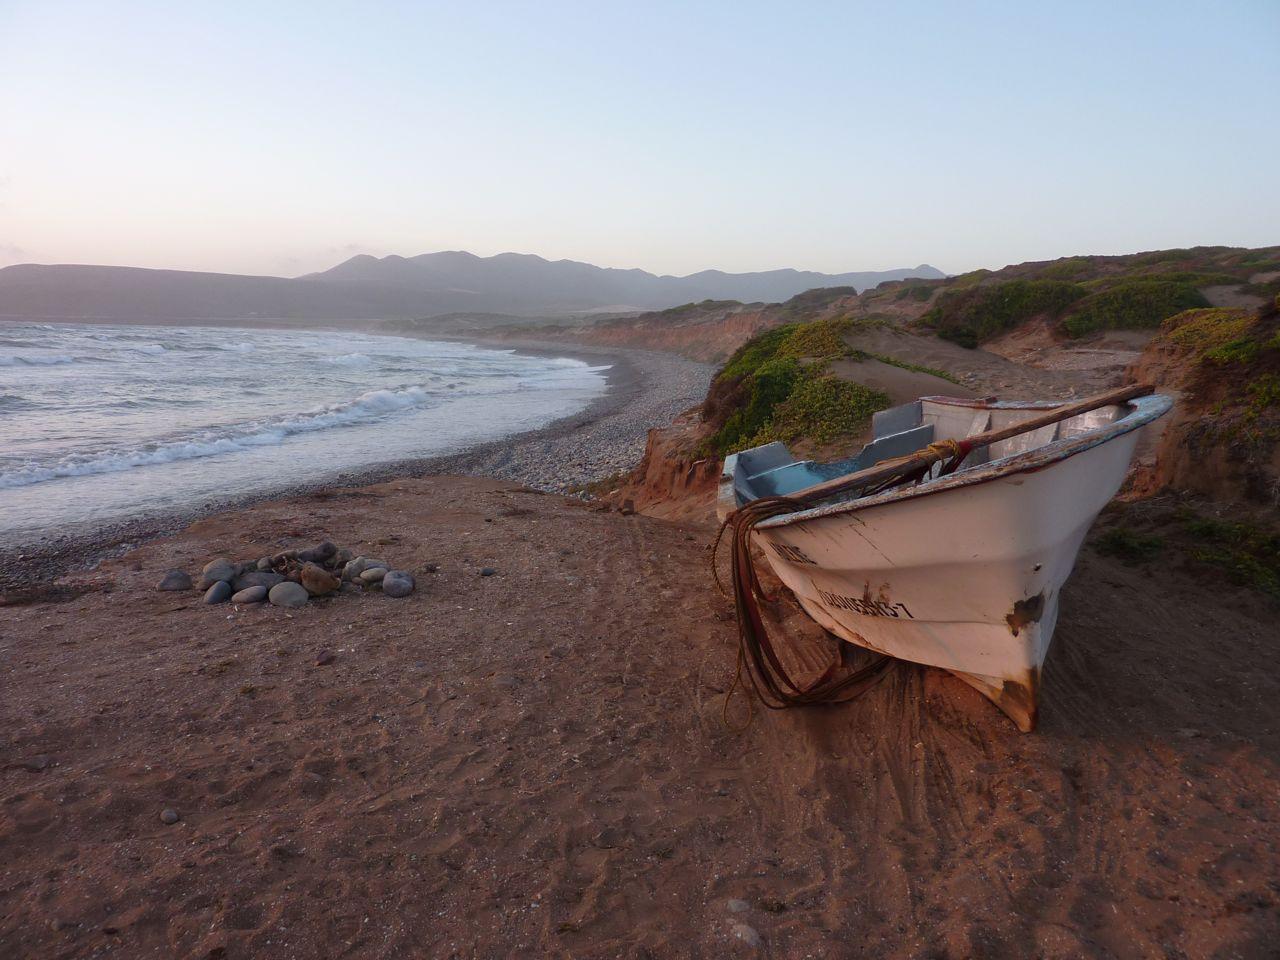 punta cabras and a shipwreck